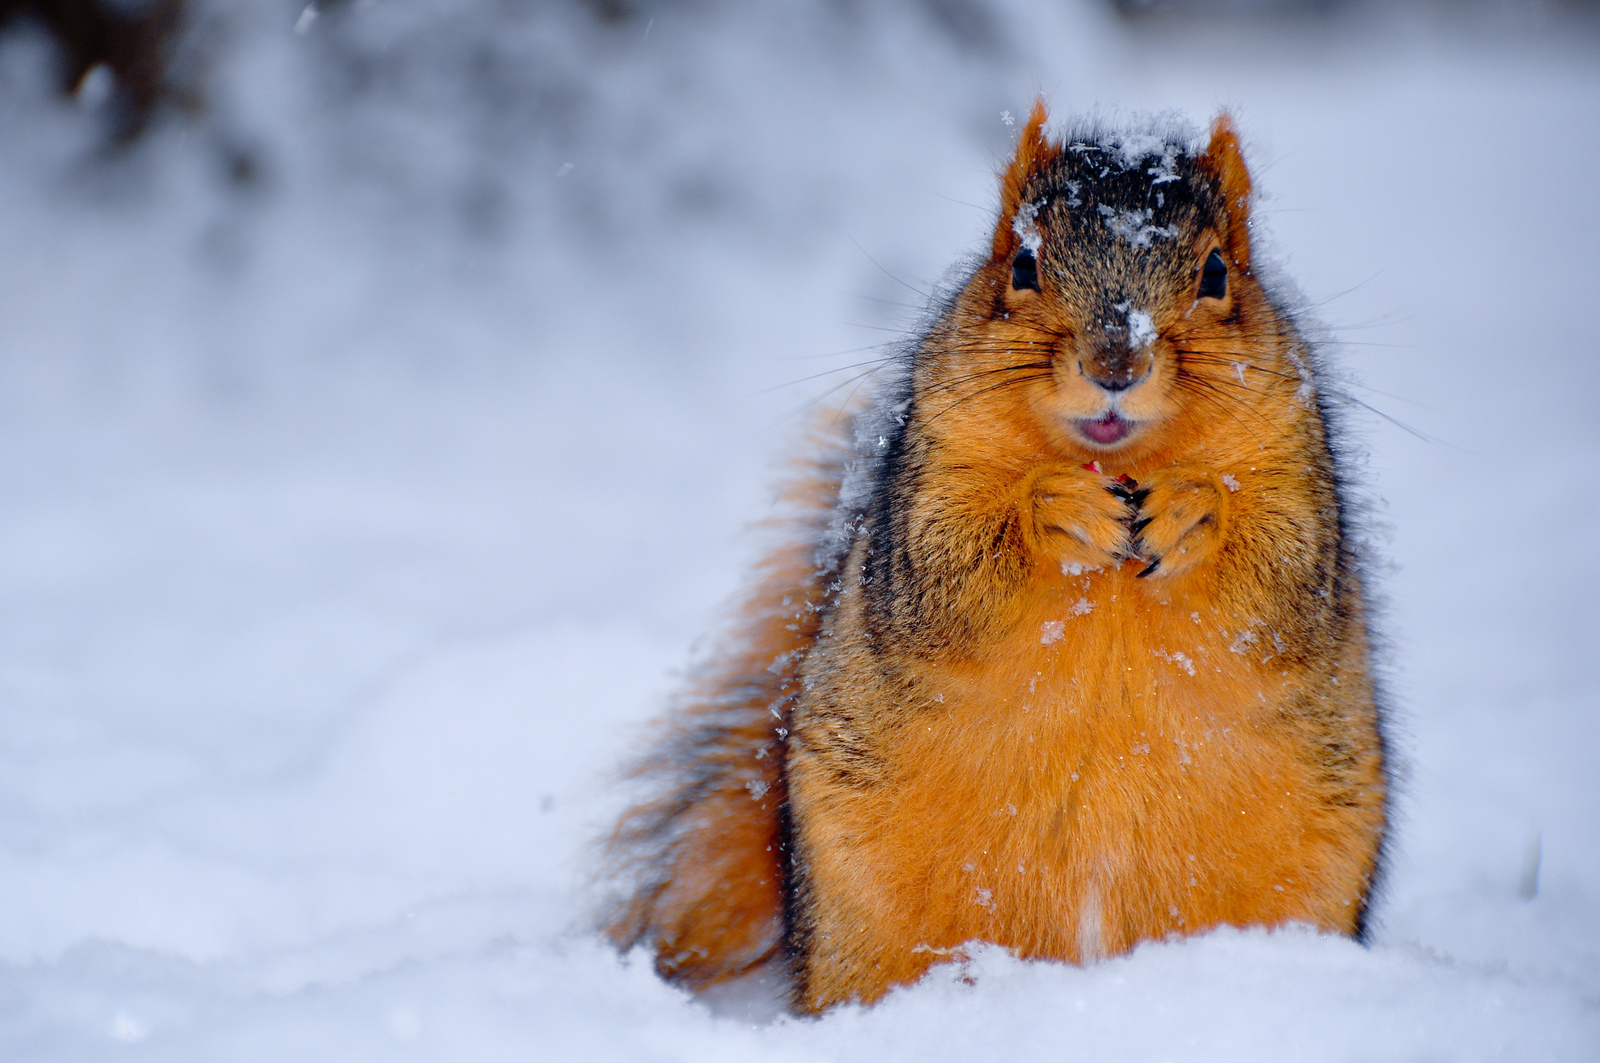 Squirrel photo via Michigan in Pictures